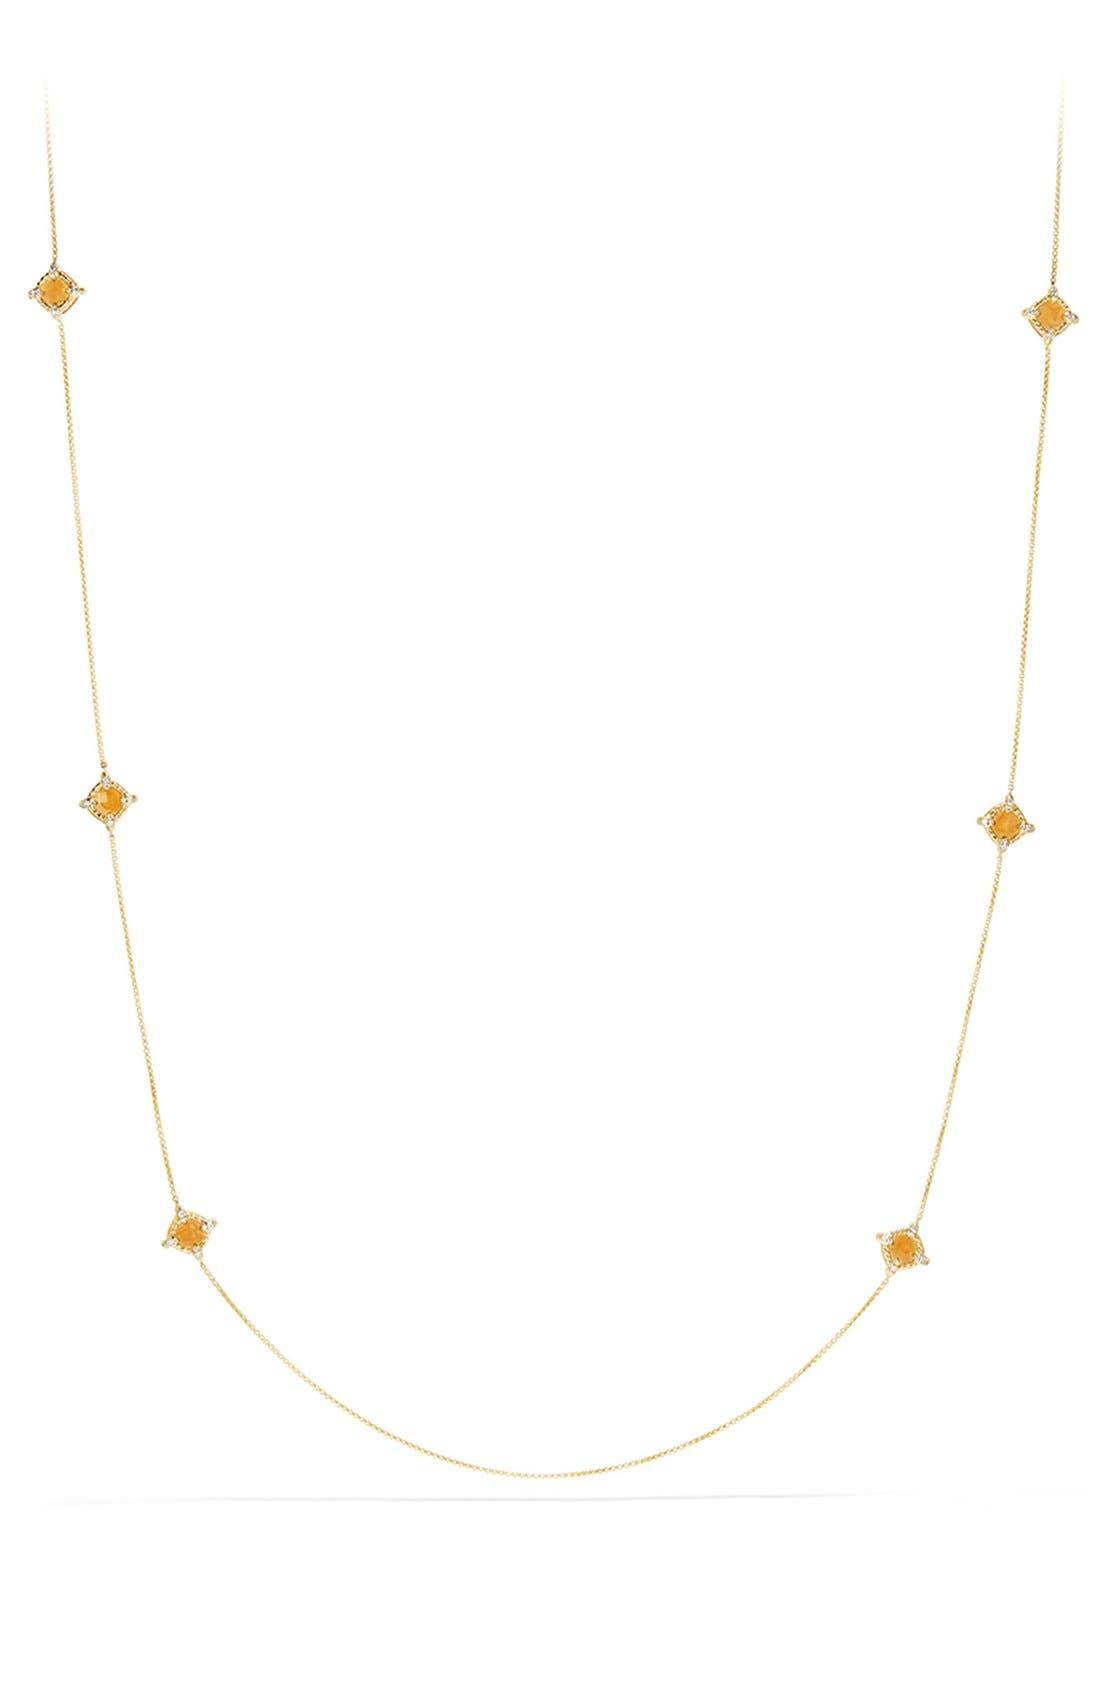 'Châtelaine' Long Semiprecious Stone Necklace with Diamonds,                             Alternate thumbnail 2, color,                             CITRINE